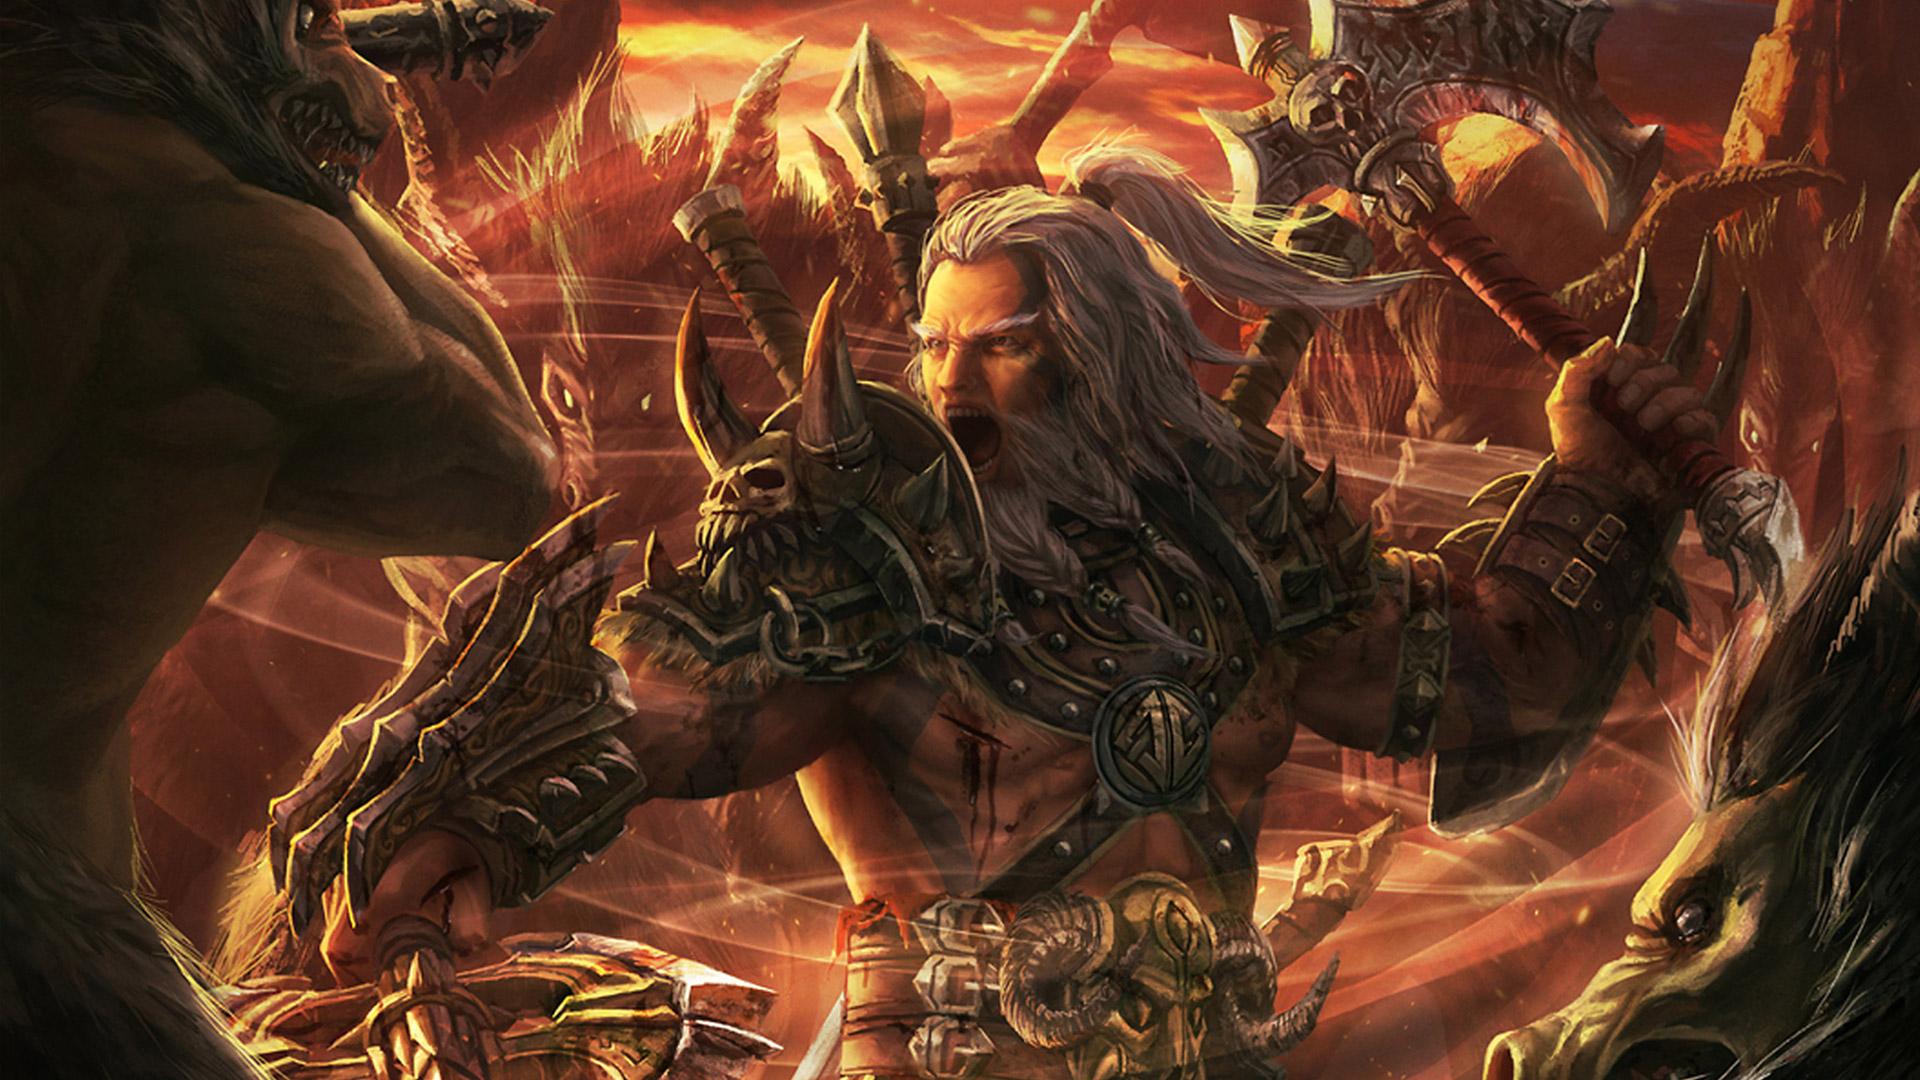 Diablo 3 Barbarian Wallpaper 4k Barbarian Diablo 3 Lore 3255530 Hd Wallpaper Backgrounds Download